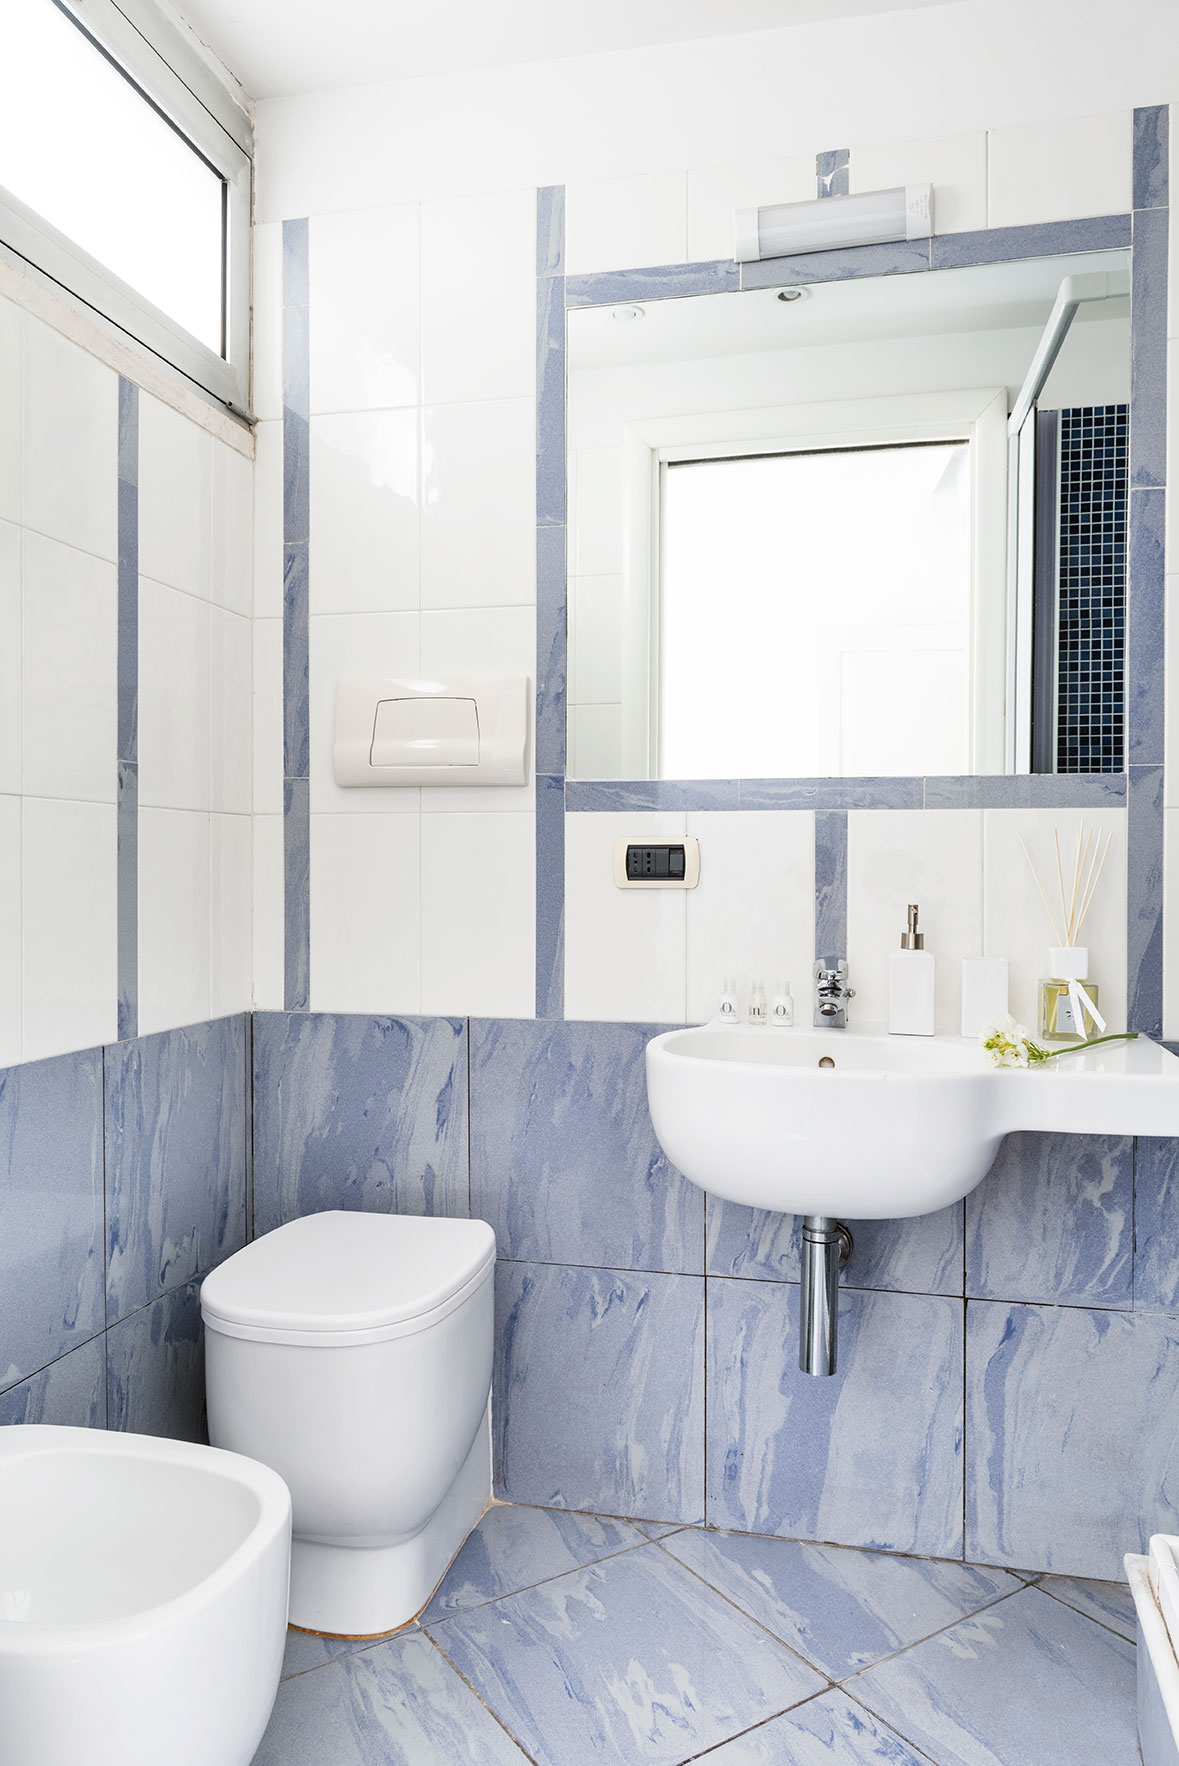 camere-standard-fiorentini-residence-napoli-1